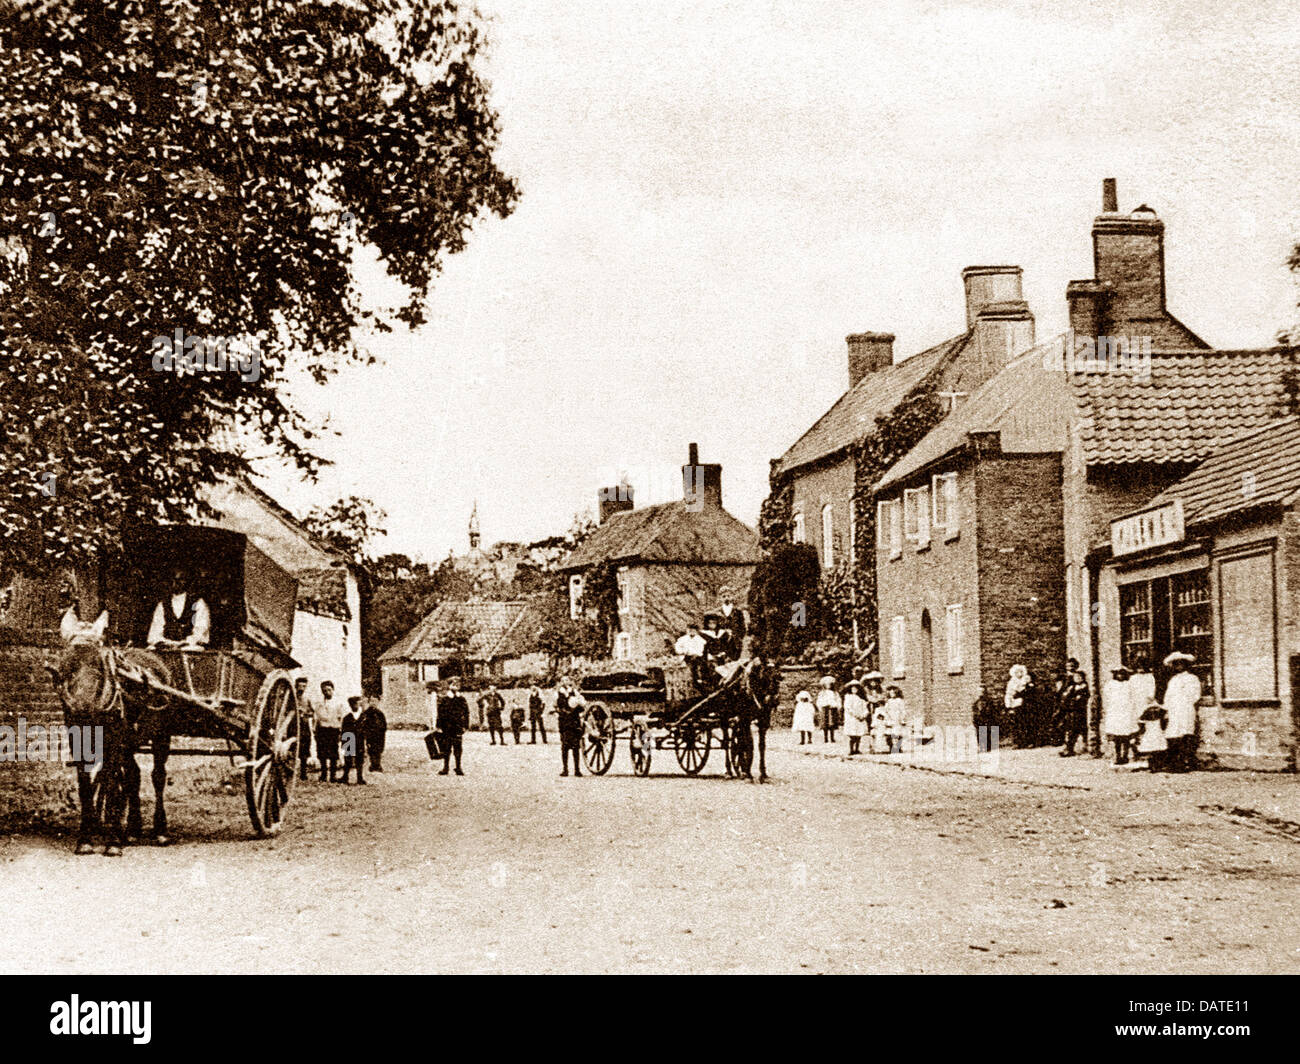 Flintham early 1900s - Stock Image